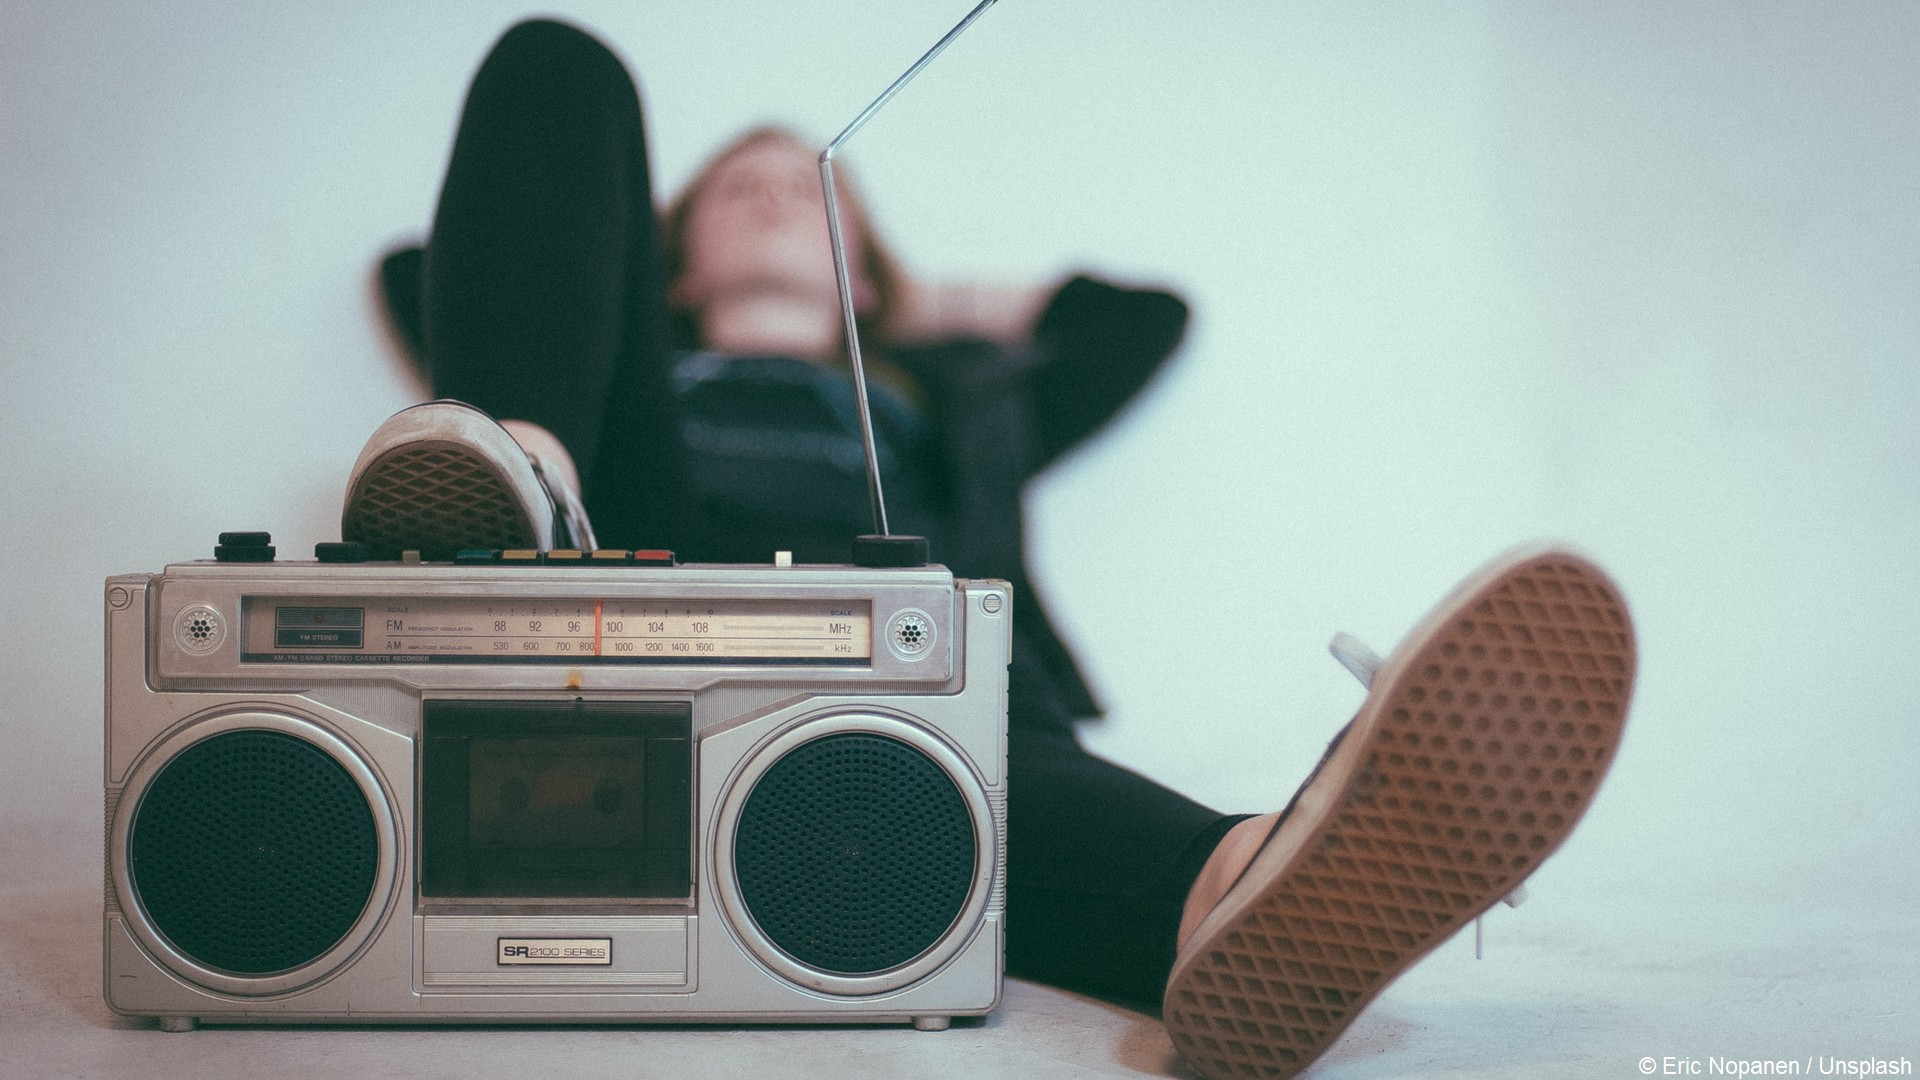 Radio (c) Eric Nopanen Unsplash